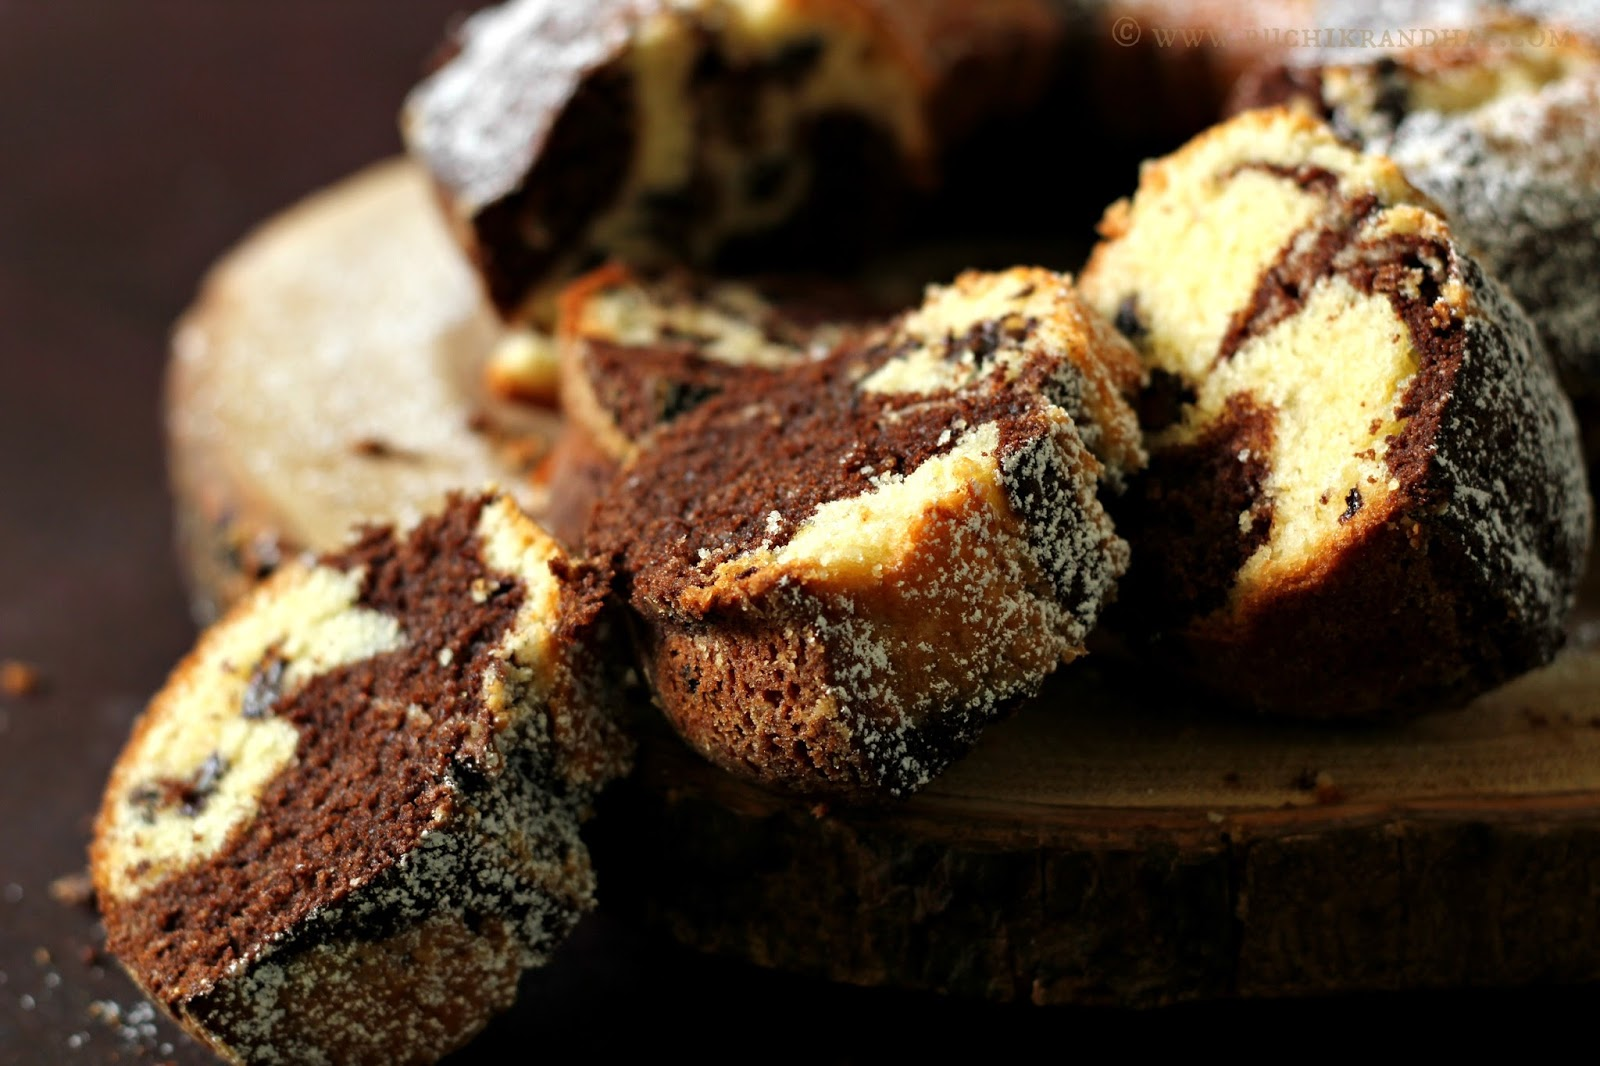 Chocolate Marbled Love Cake